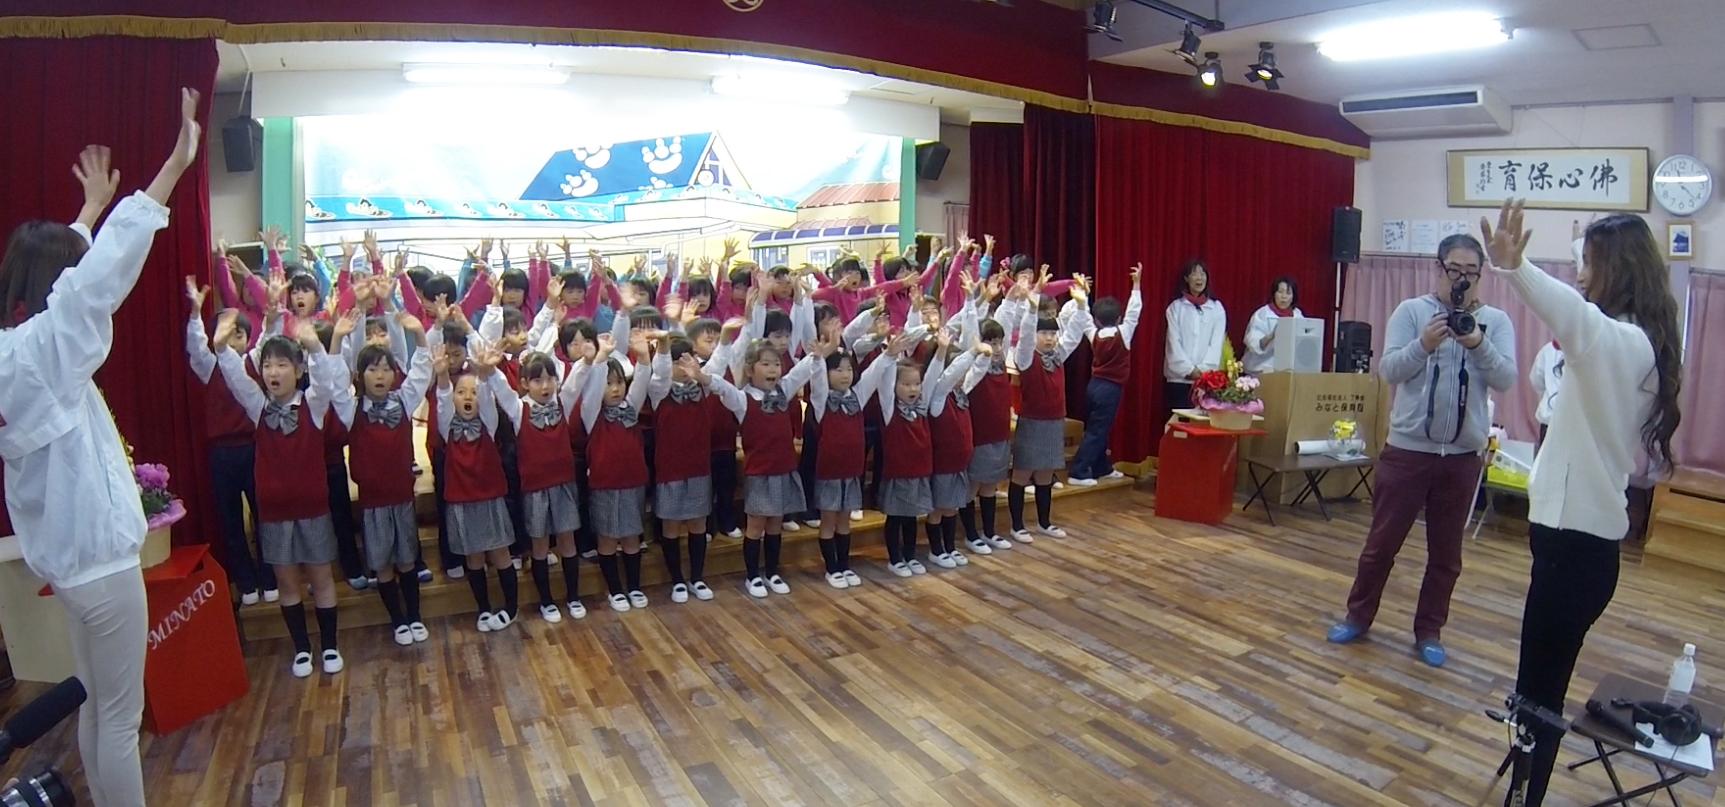 my-dream-song-minato-preschool-3.jpg